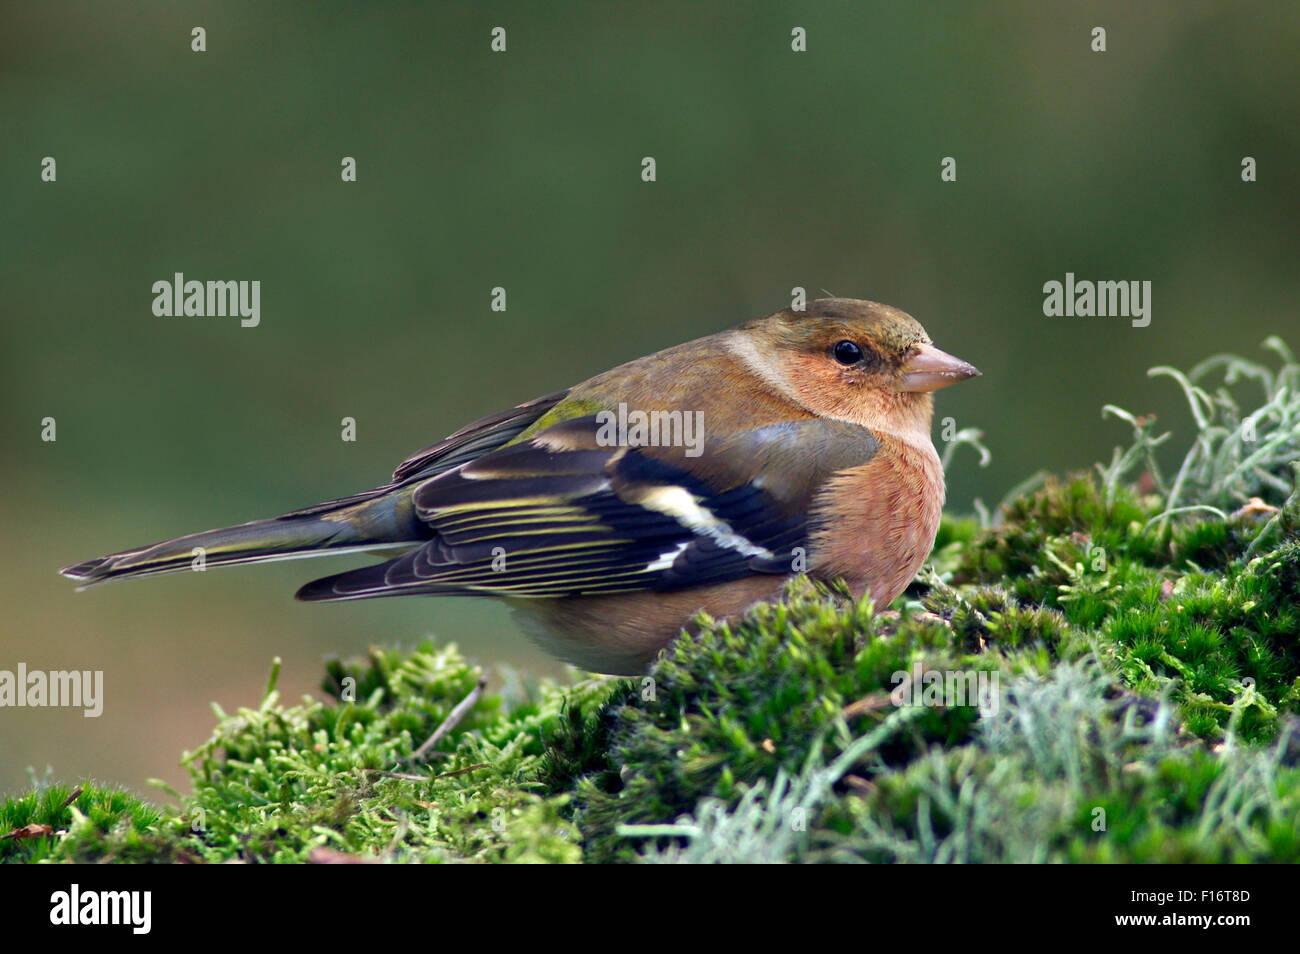 Common chaffinch (Fringilla coelebs) female portrait - Stock Image